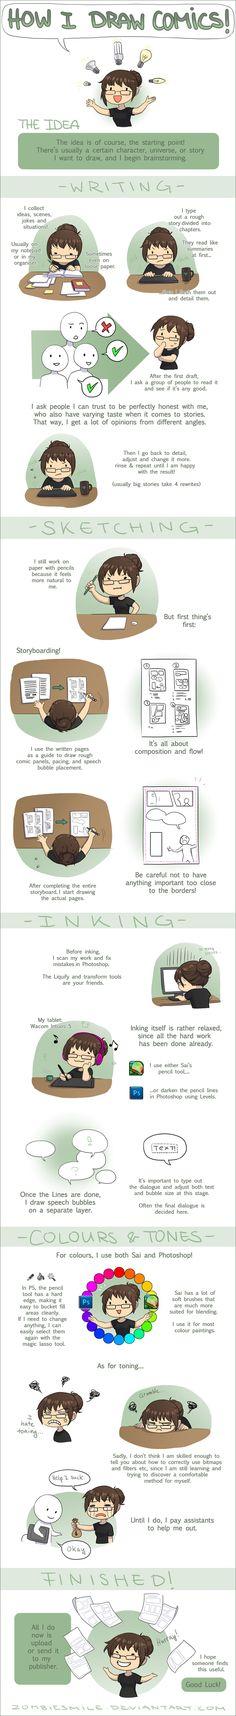 """How I Draw #Comics"" by Zombiesmile.deviantart.com on #deviantART. #Tutorials"